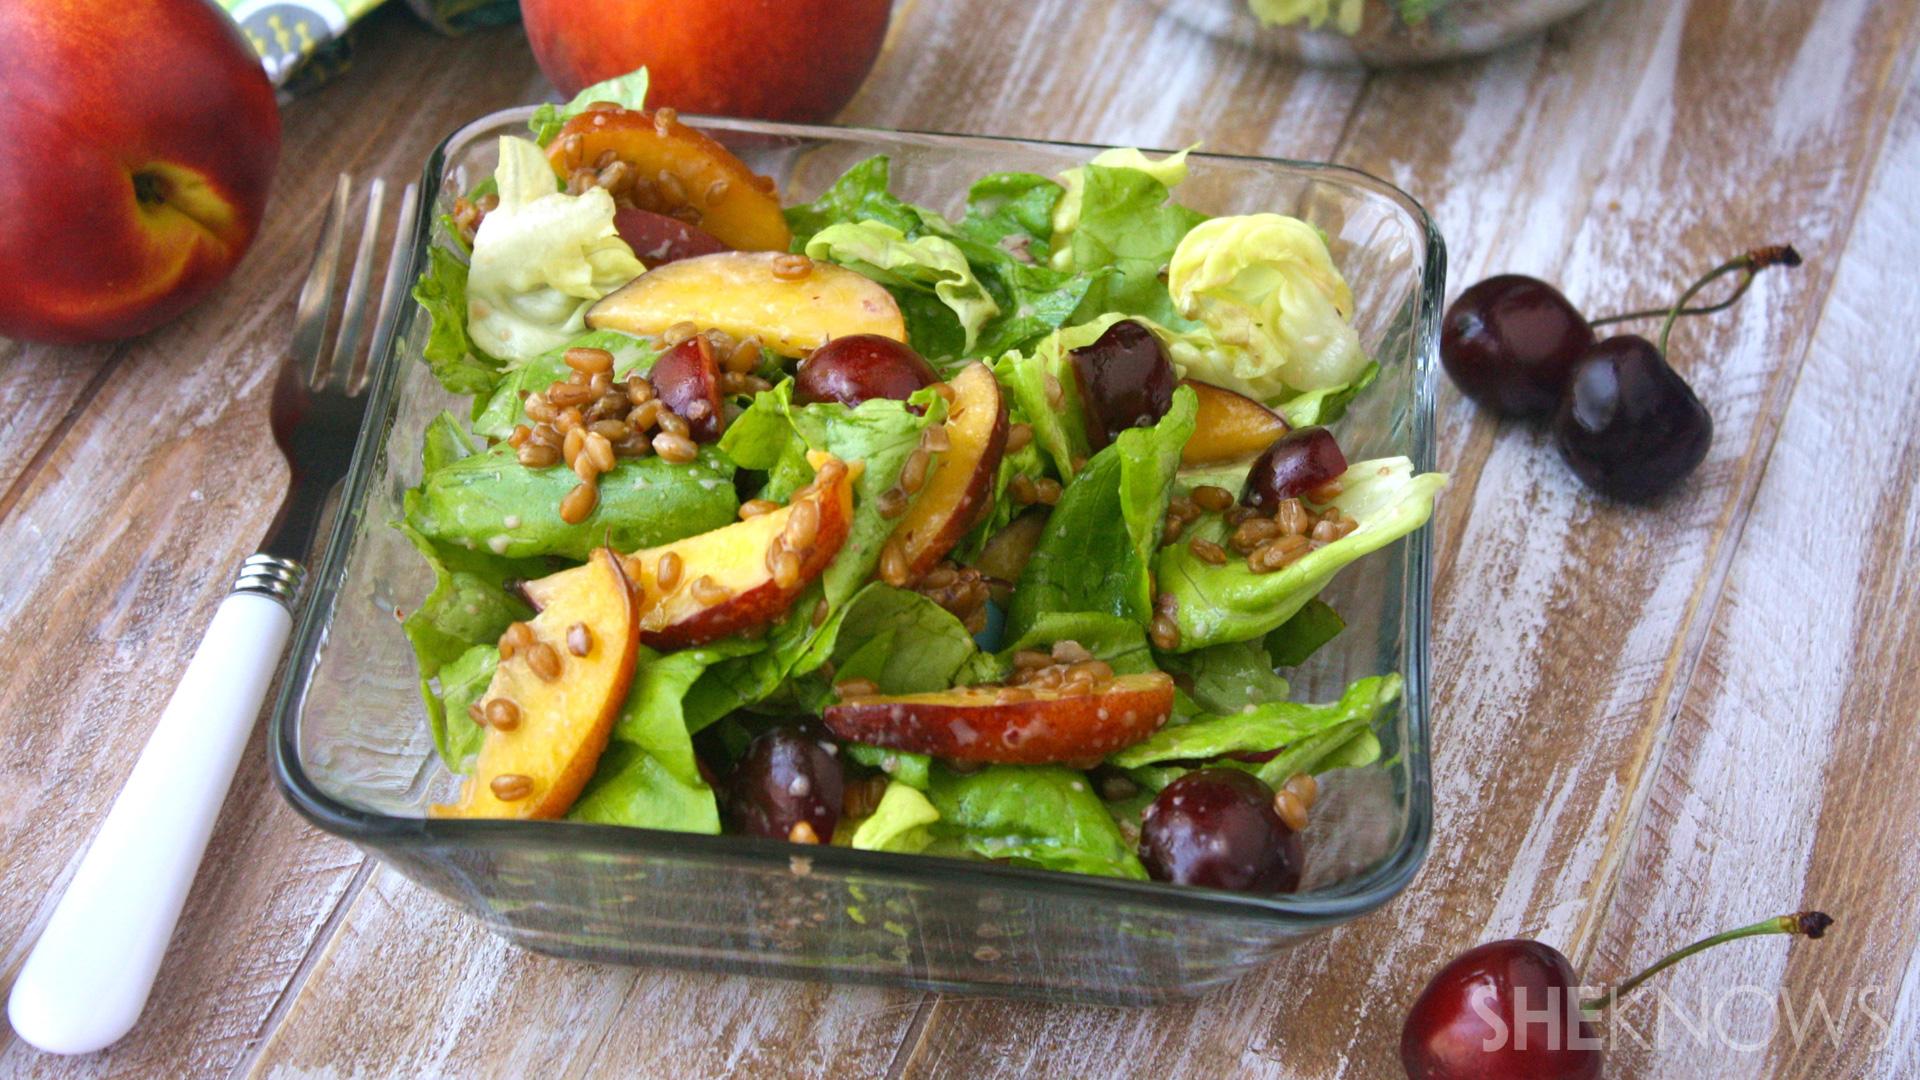 Wheat berry and stone fruit salad with cherry-yogurt dressing